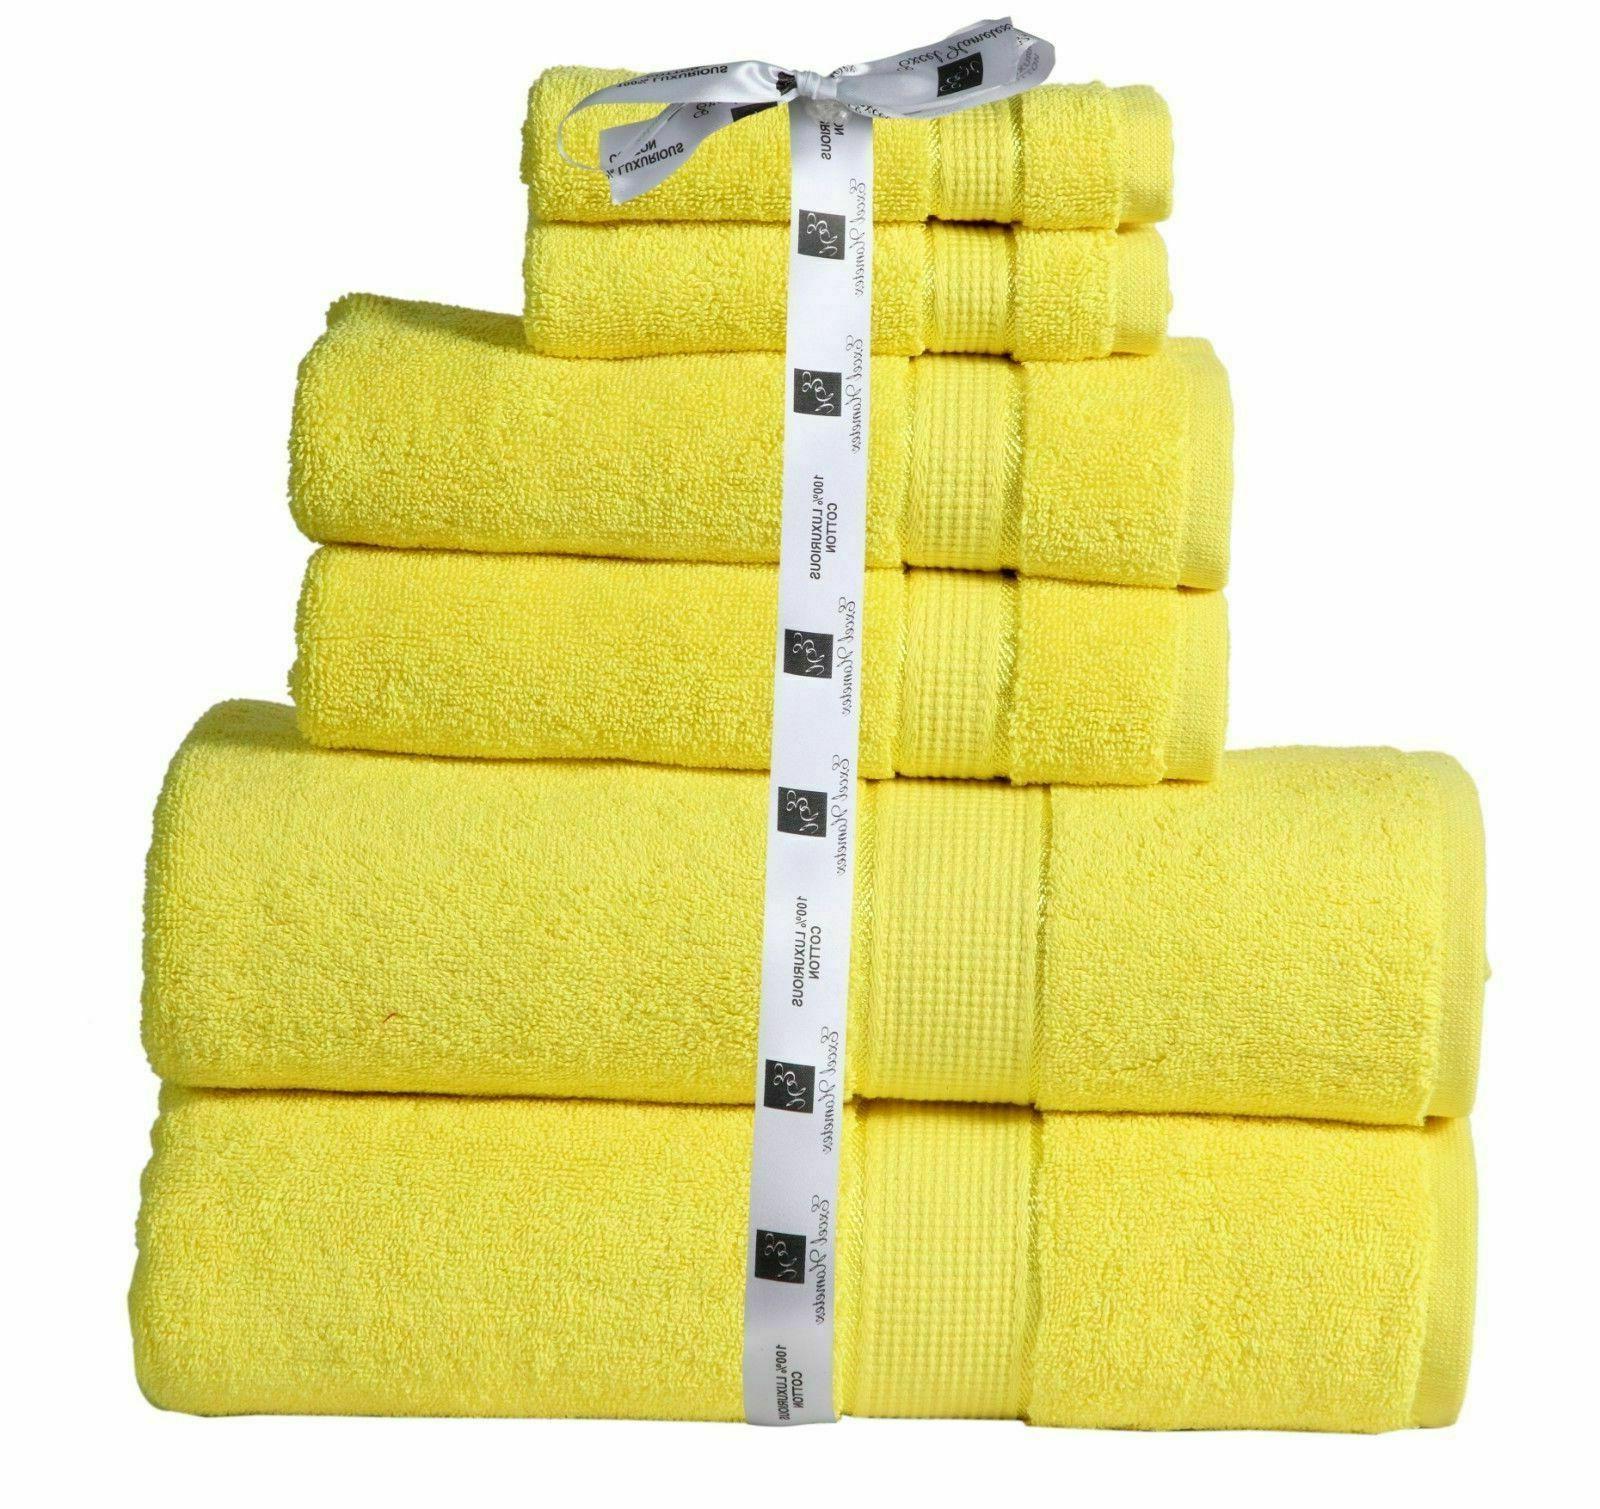 Towel Set 2 Bath Hand Towel